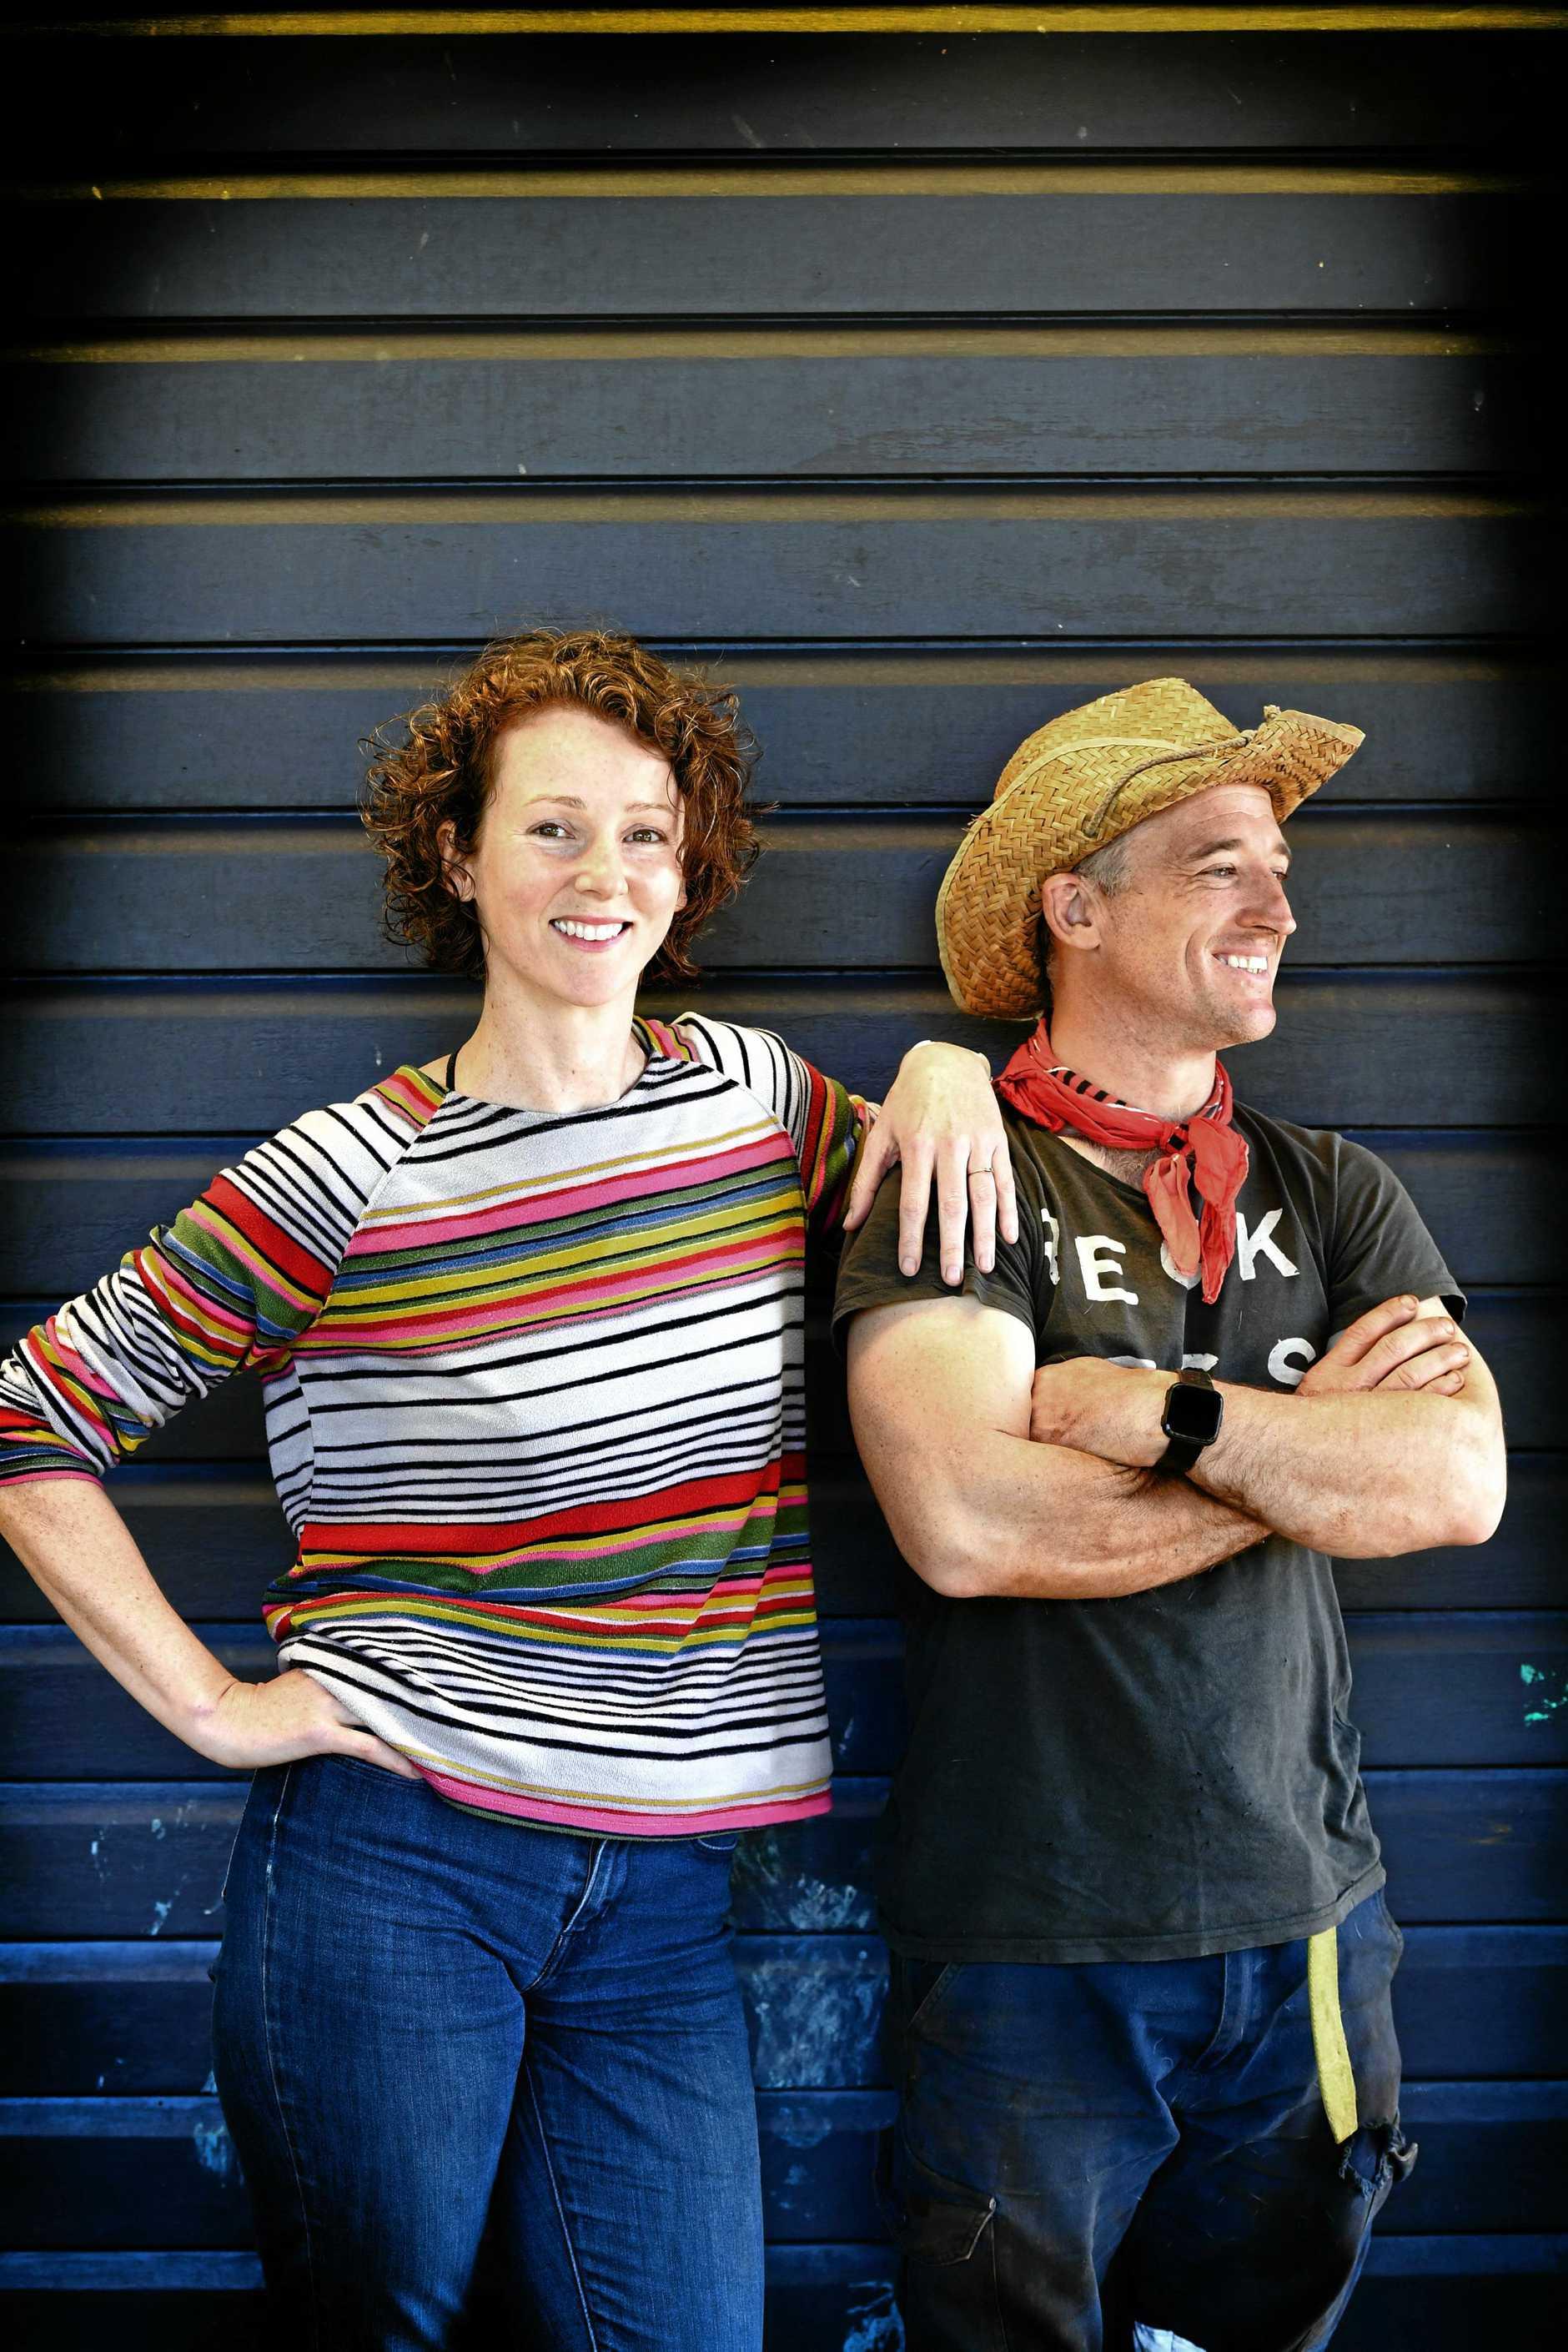 Christy Shelper and DJ Garner left the high flying life of a international circus performer for the rewarding world of organic farming.